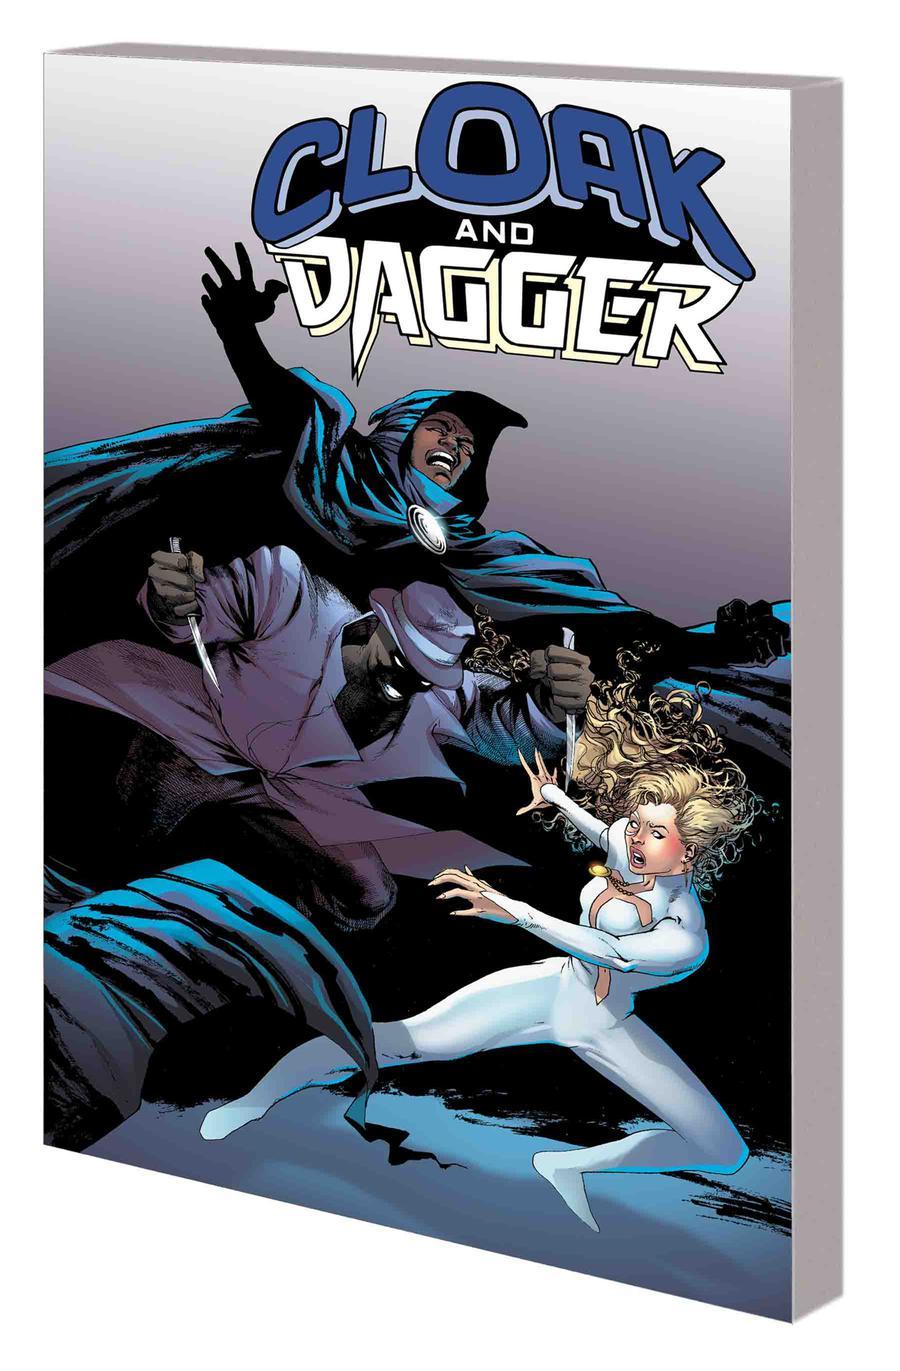 Cloak And Dagger Predator And Prey TP